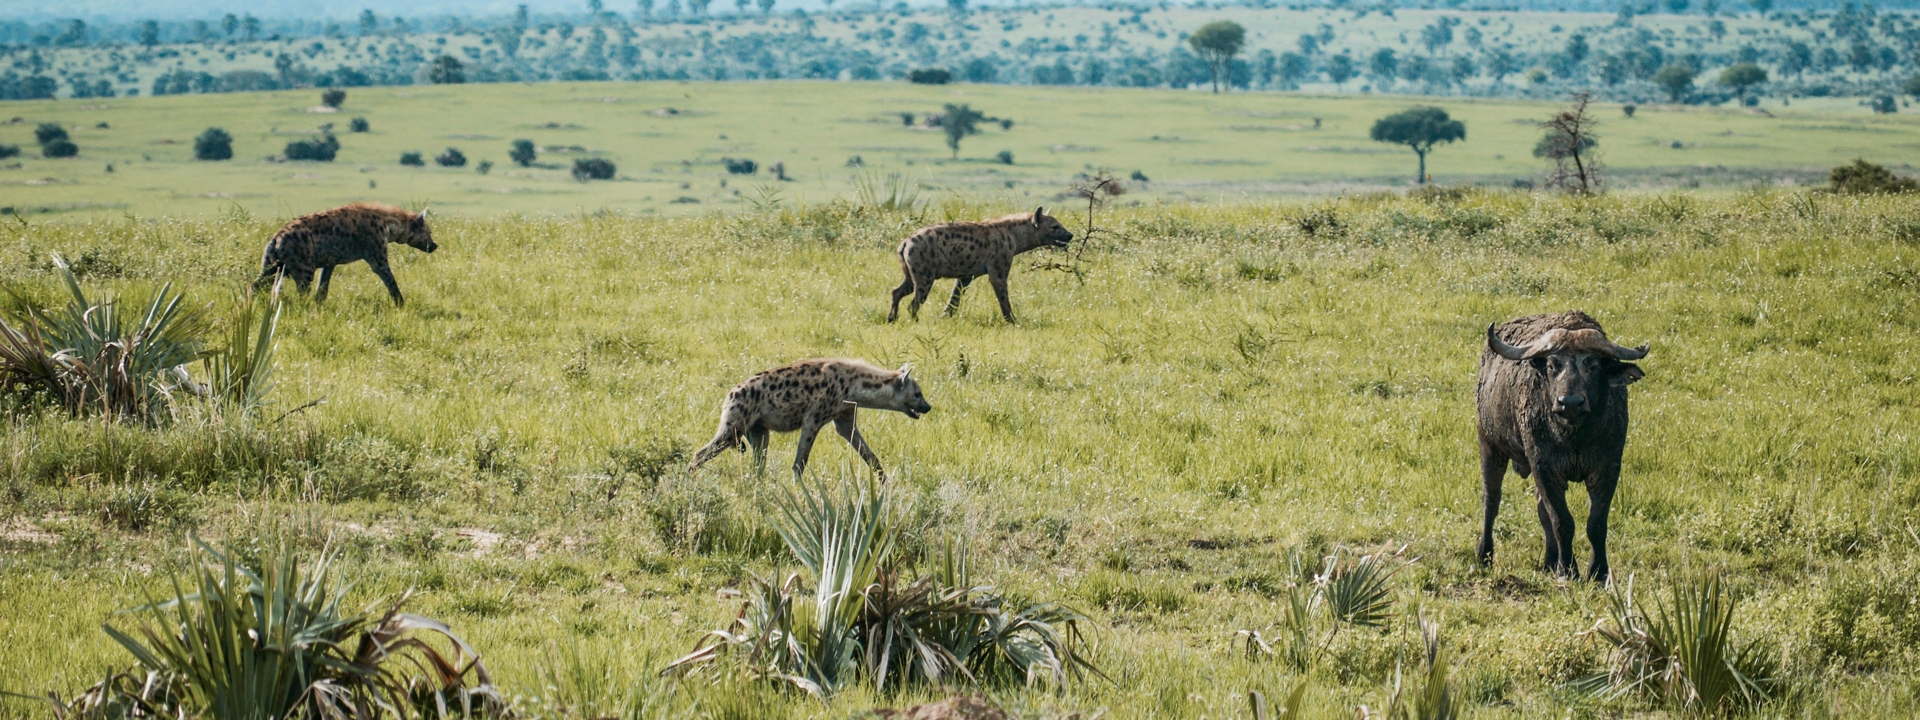 titel-uganda-urprung-neu-elela-africa